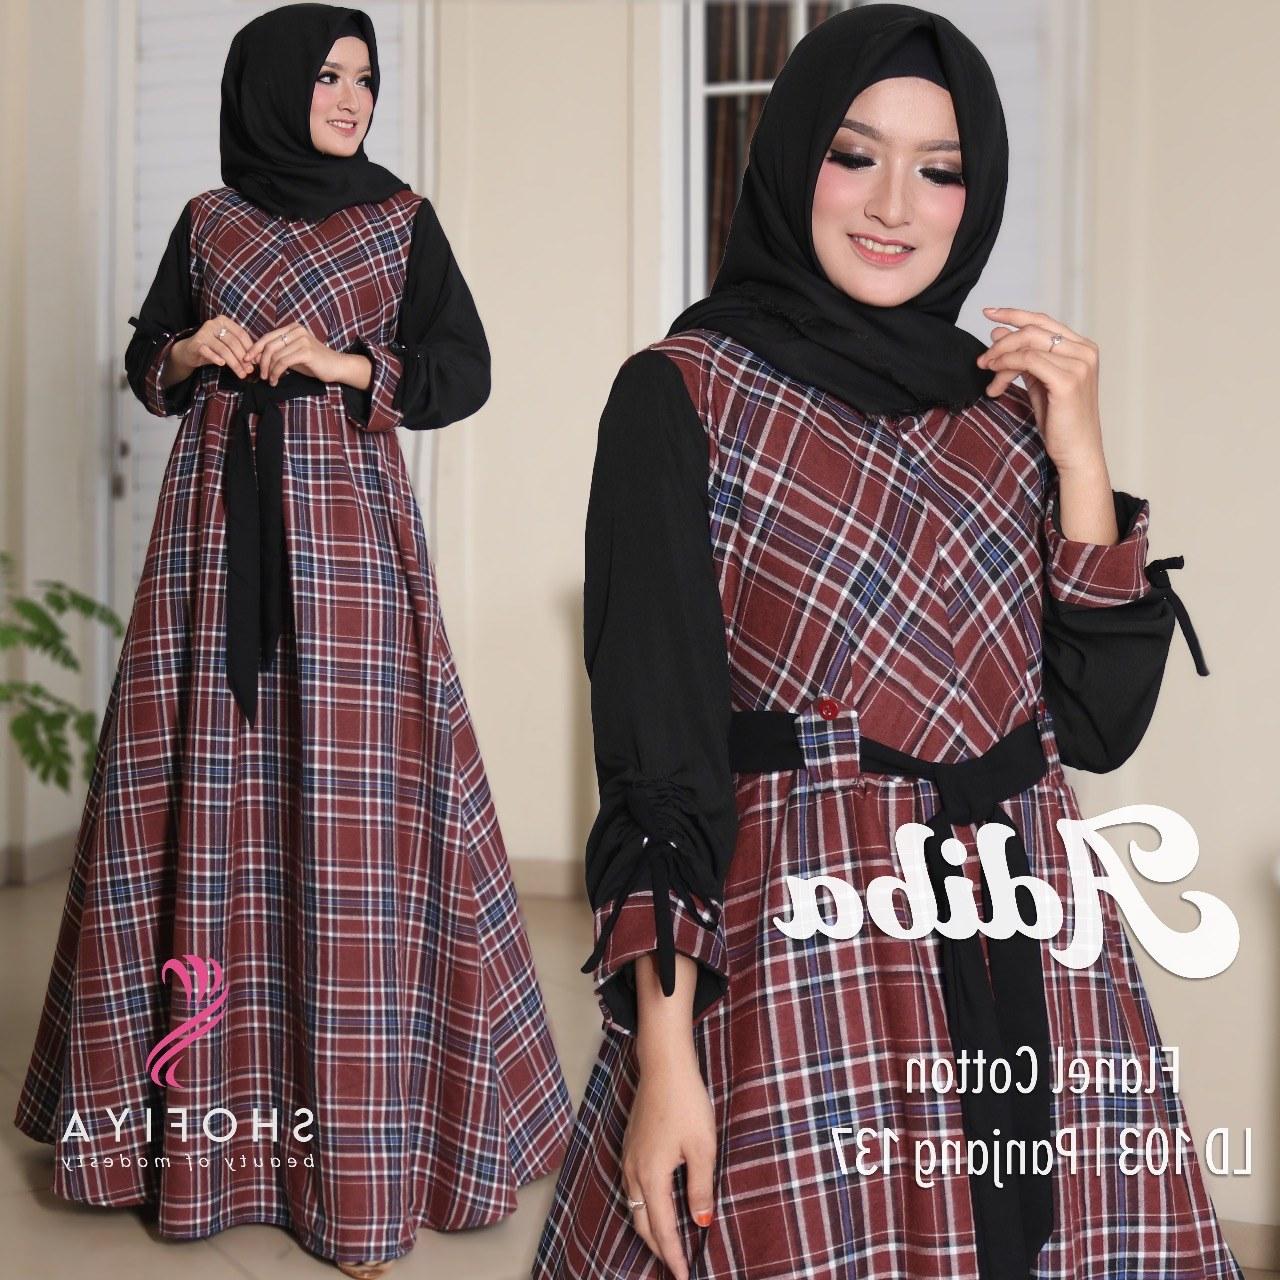 Model Trend Baju Lebaran Wddj Baju Gamis Terbaru Lebaran Wa 0811 5131 482